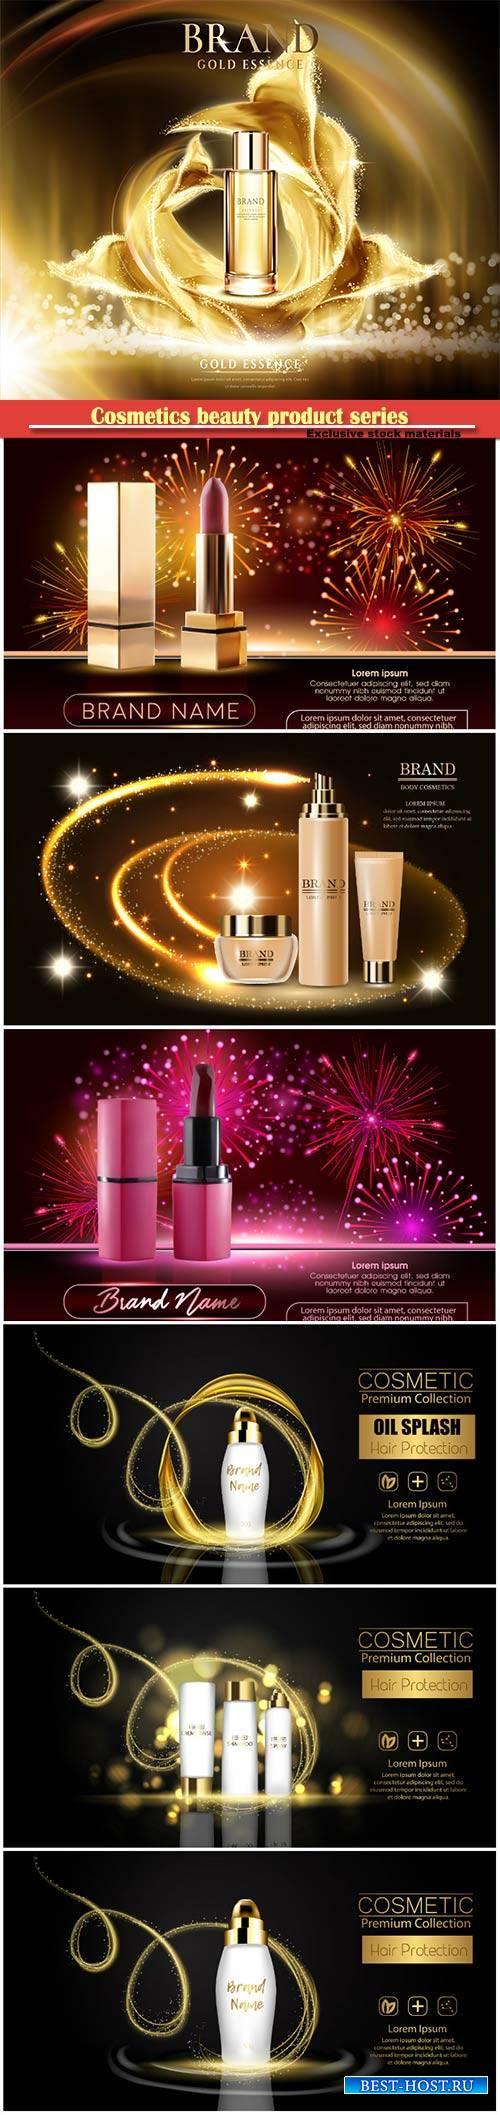 Cosmetics beauty product series, presentation banners mockup, vector illust ...